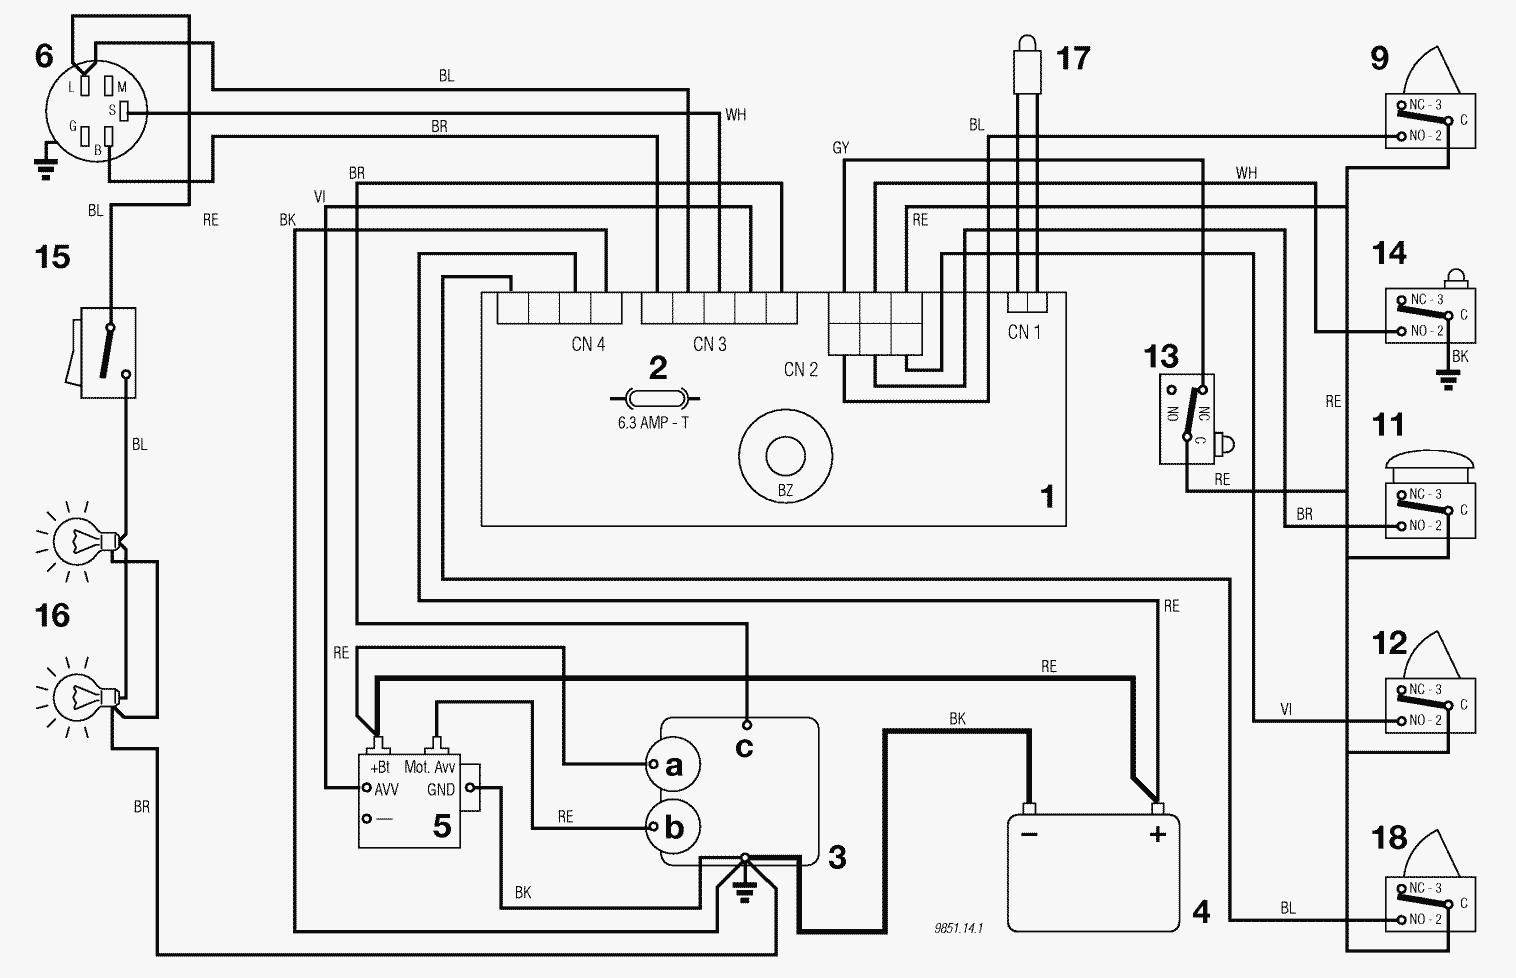 Briggs And Stratton 17 5 Hp Overhead Valve Engine Diagram